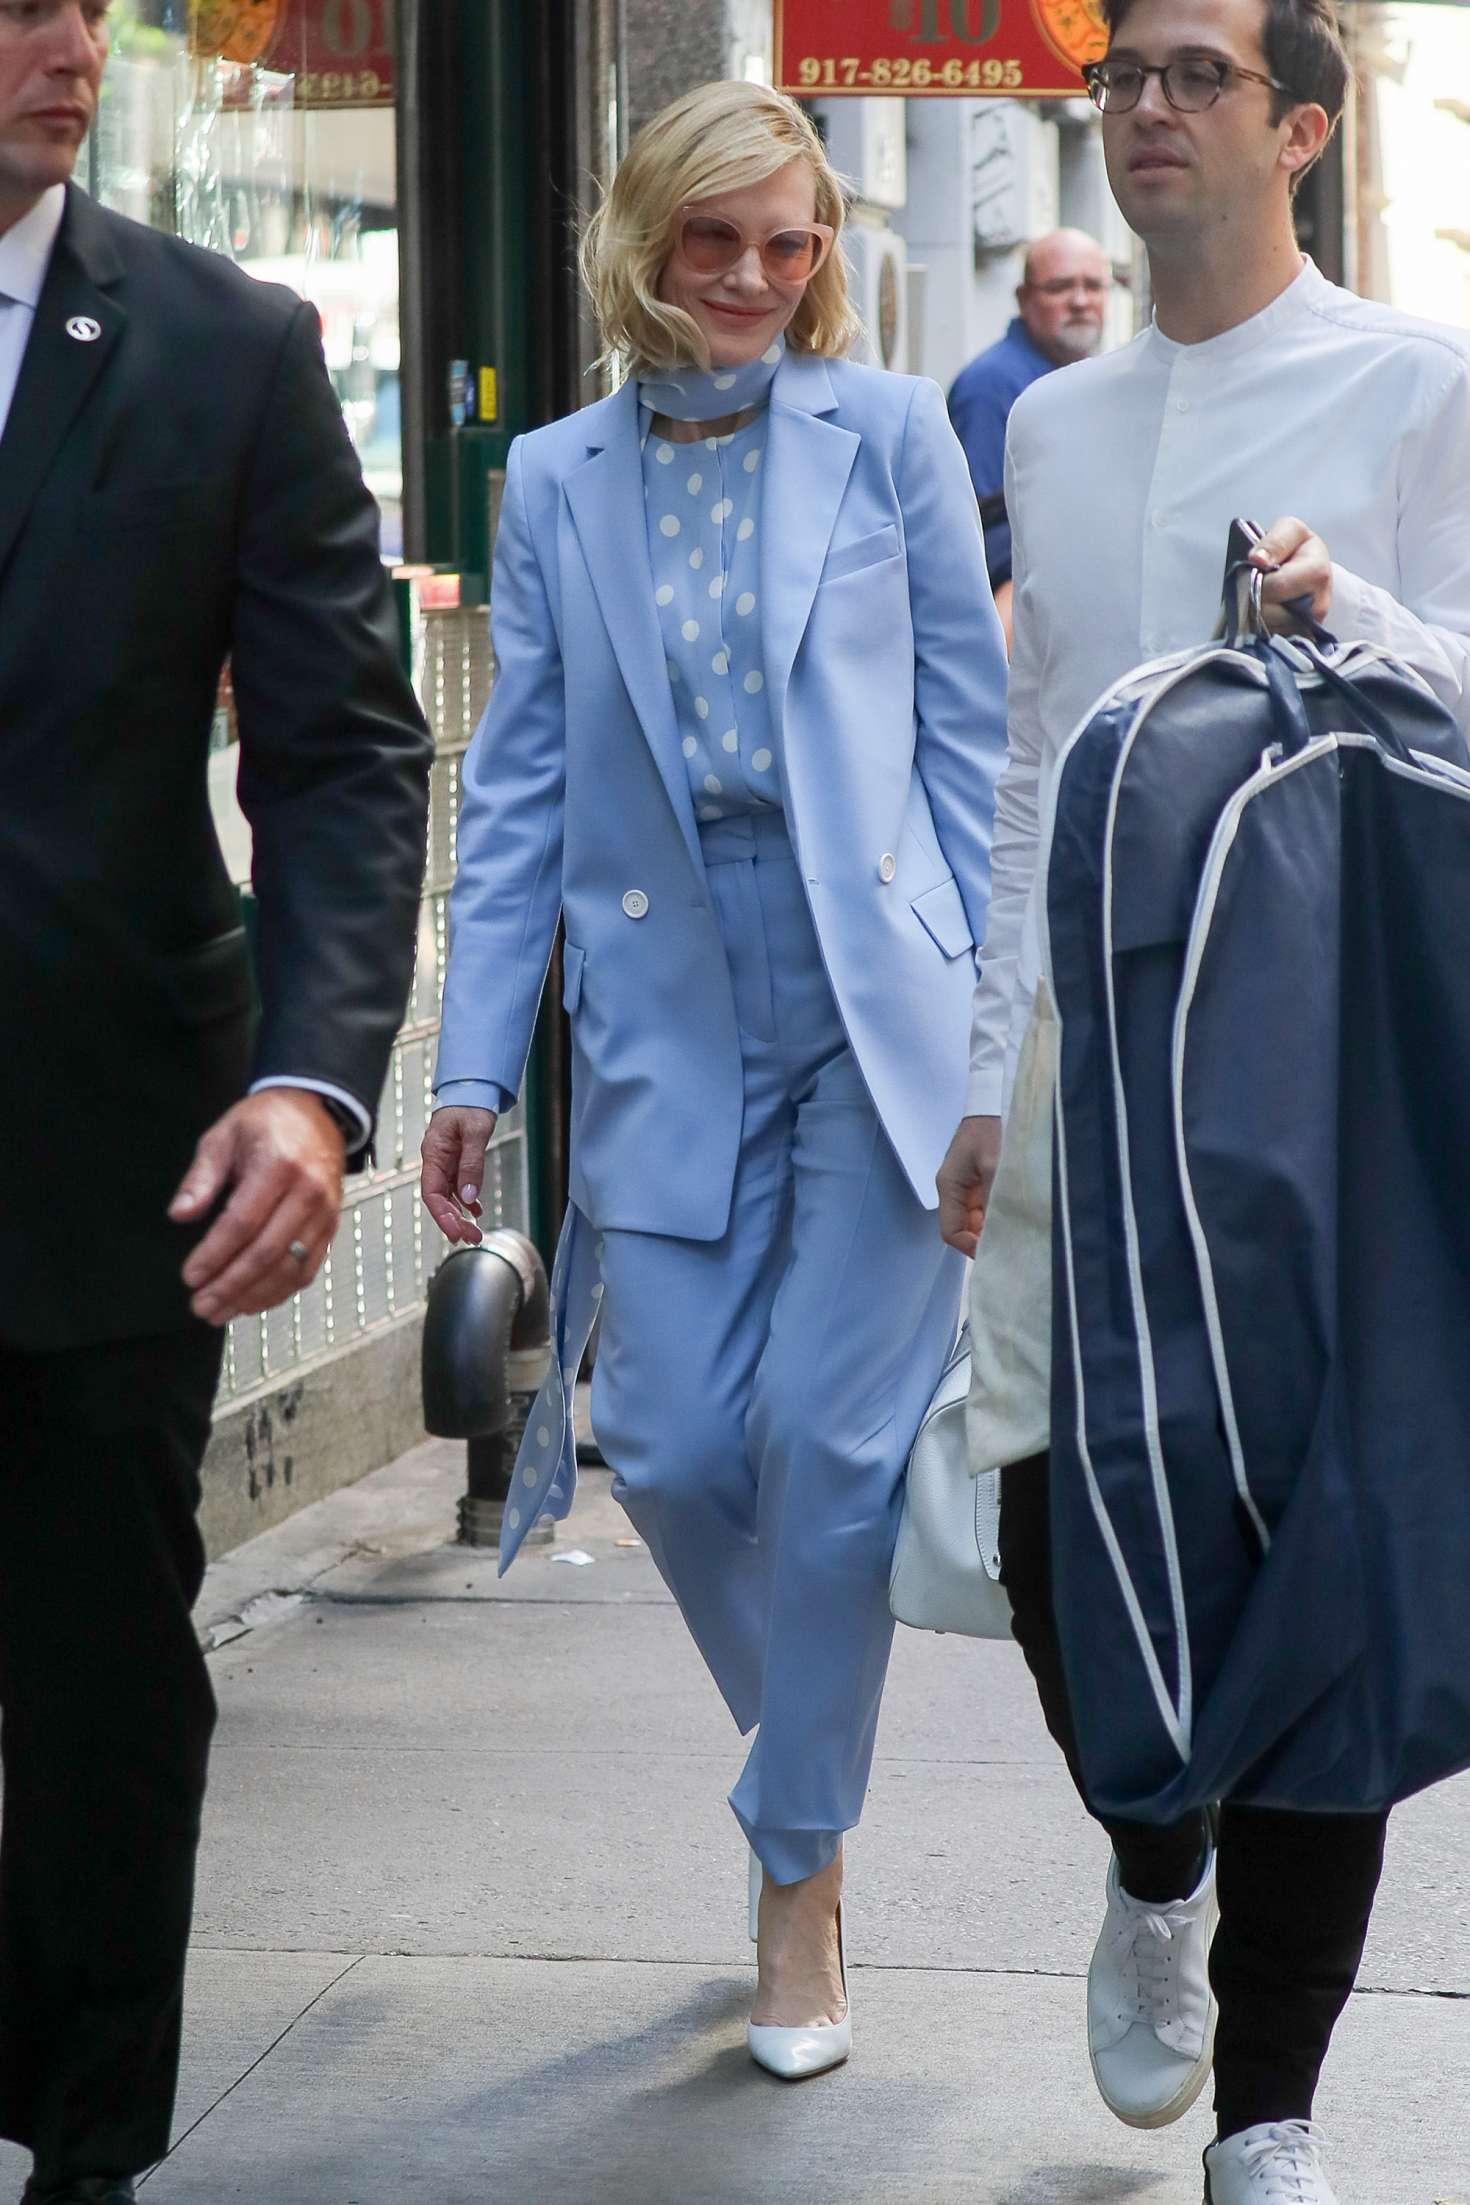 Cate Blanchett 2018 : Cate Blanchett in Light Blue outfit -02